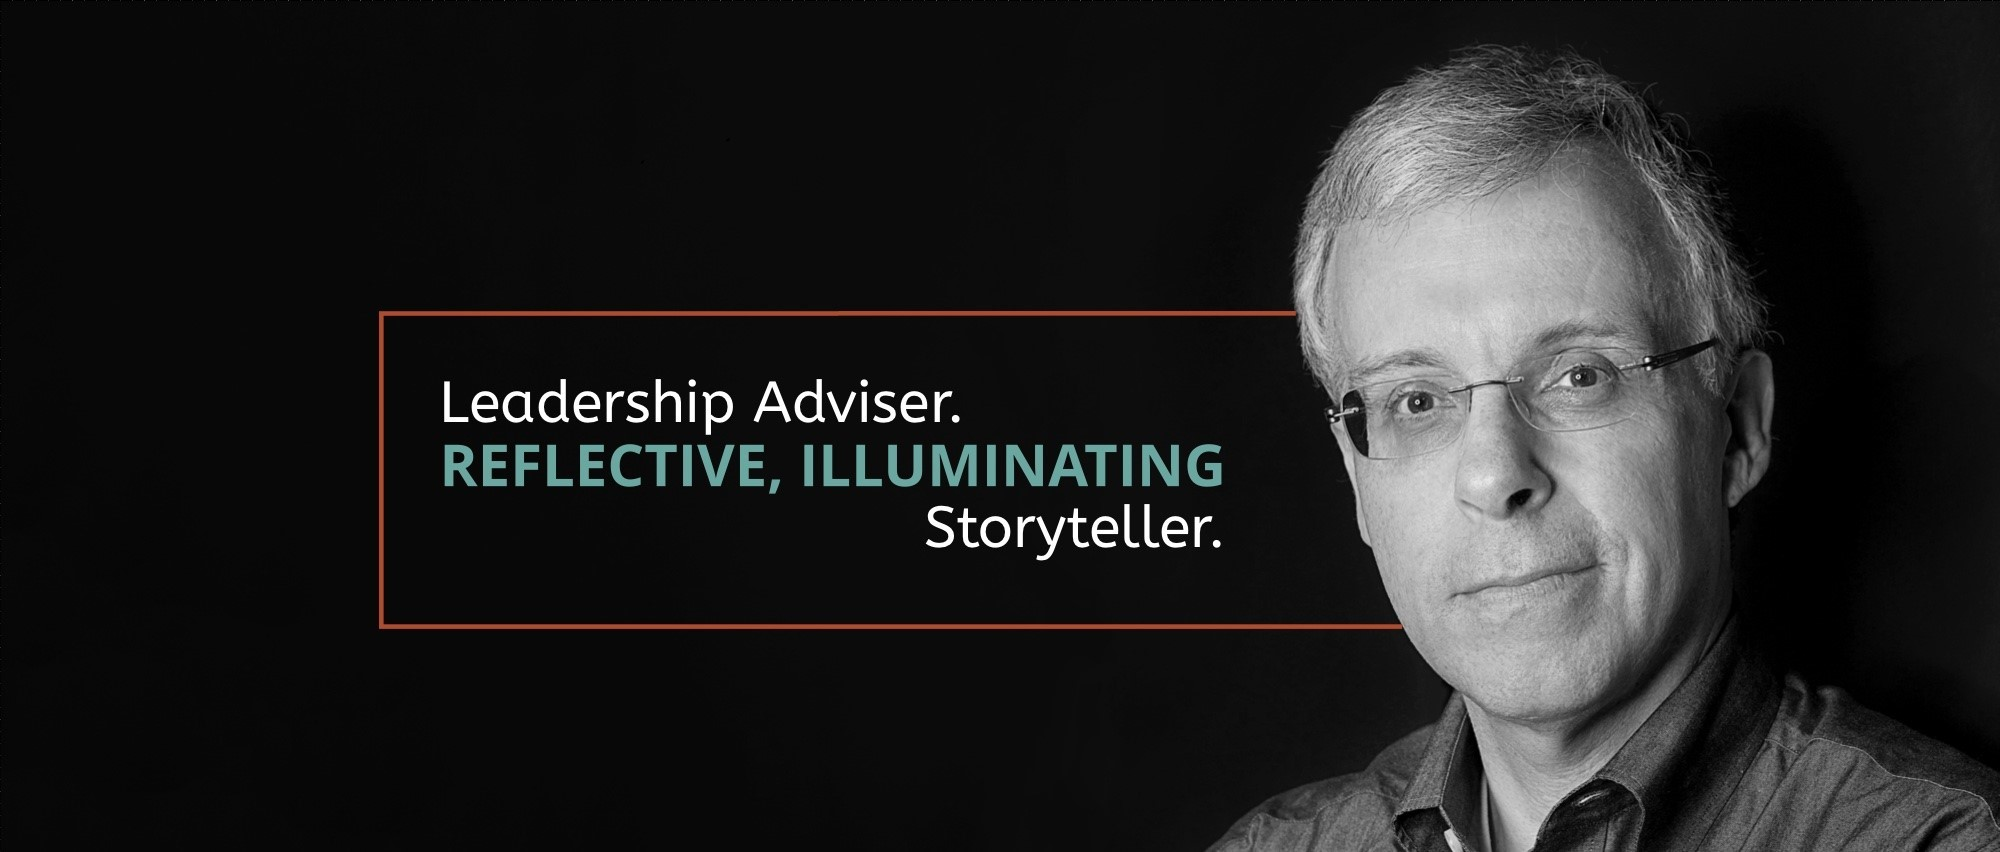 Crucible Leadership, Warwick Fairfax, Inspiration, Leadership, Coaching, Leading a Life of Significance